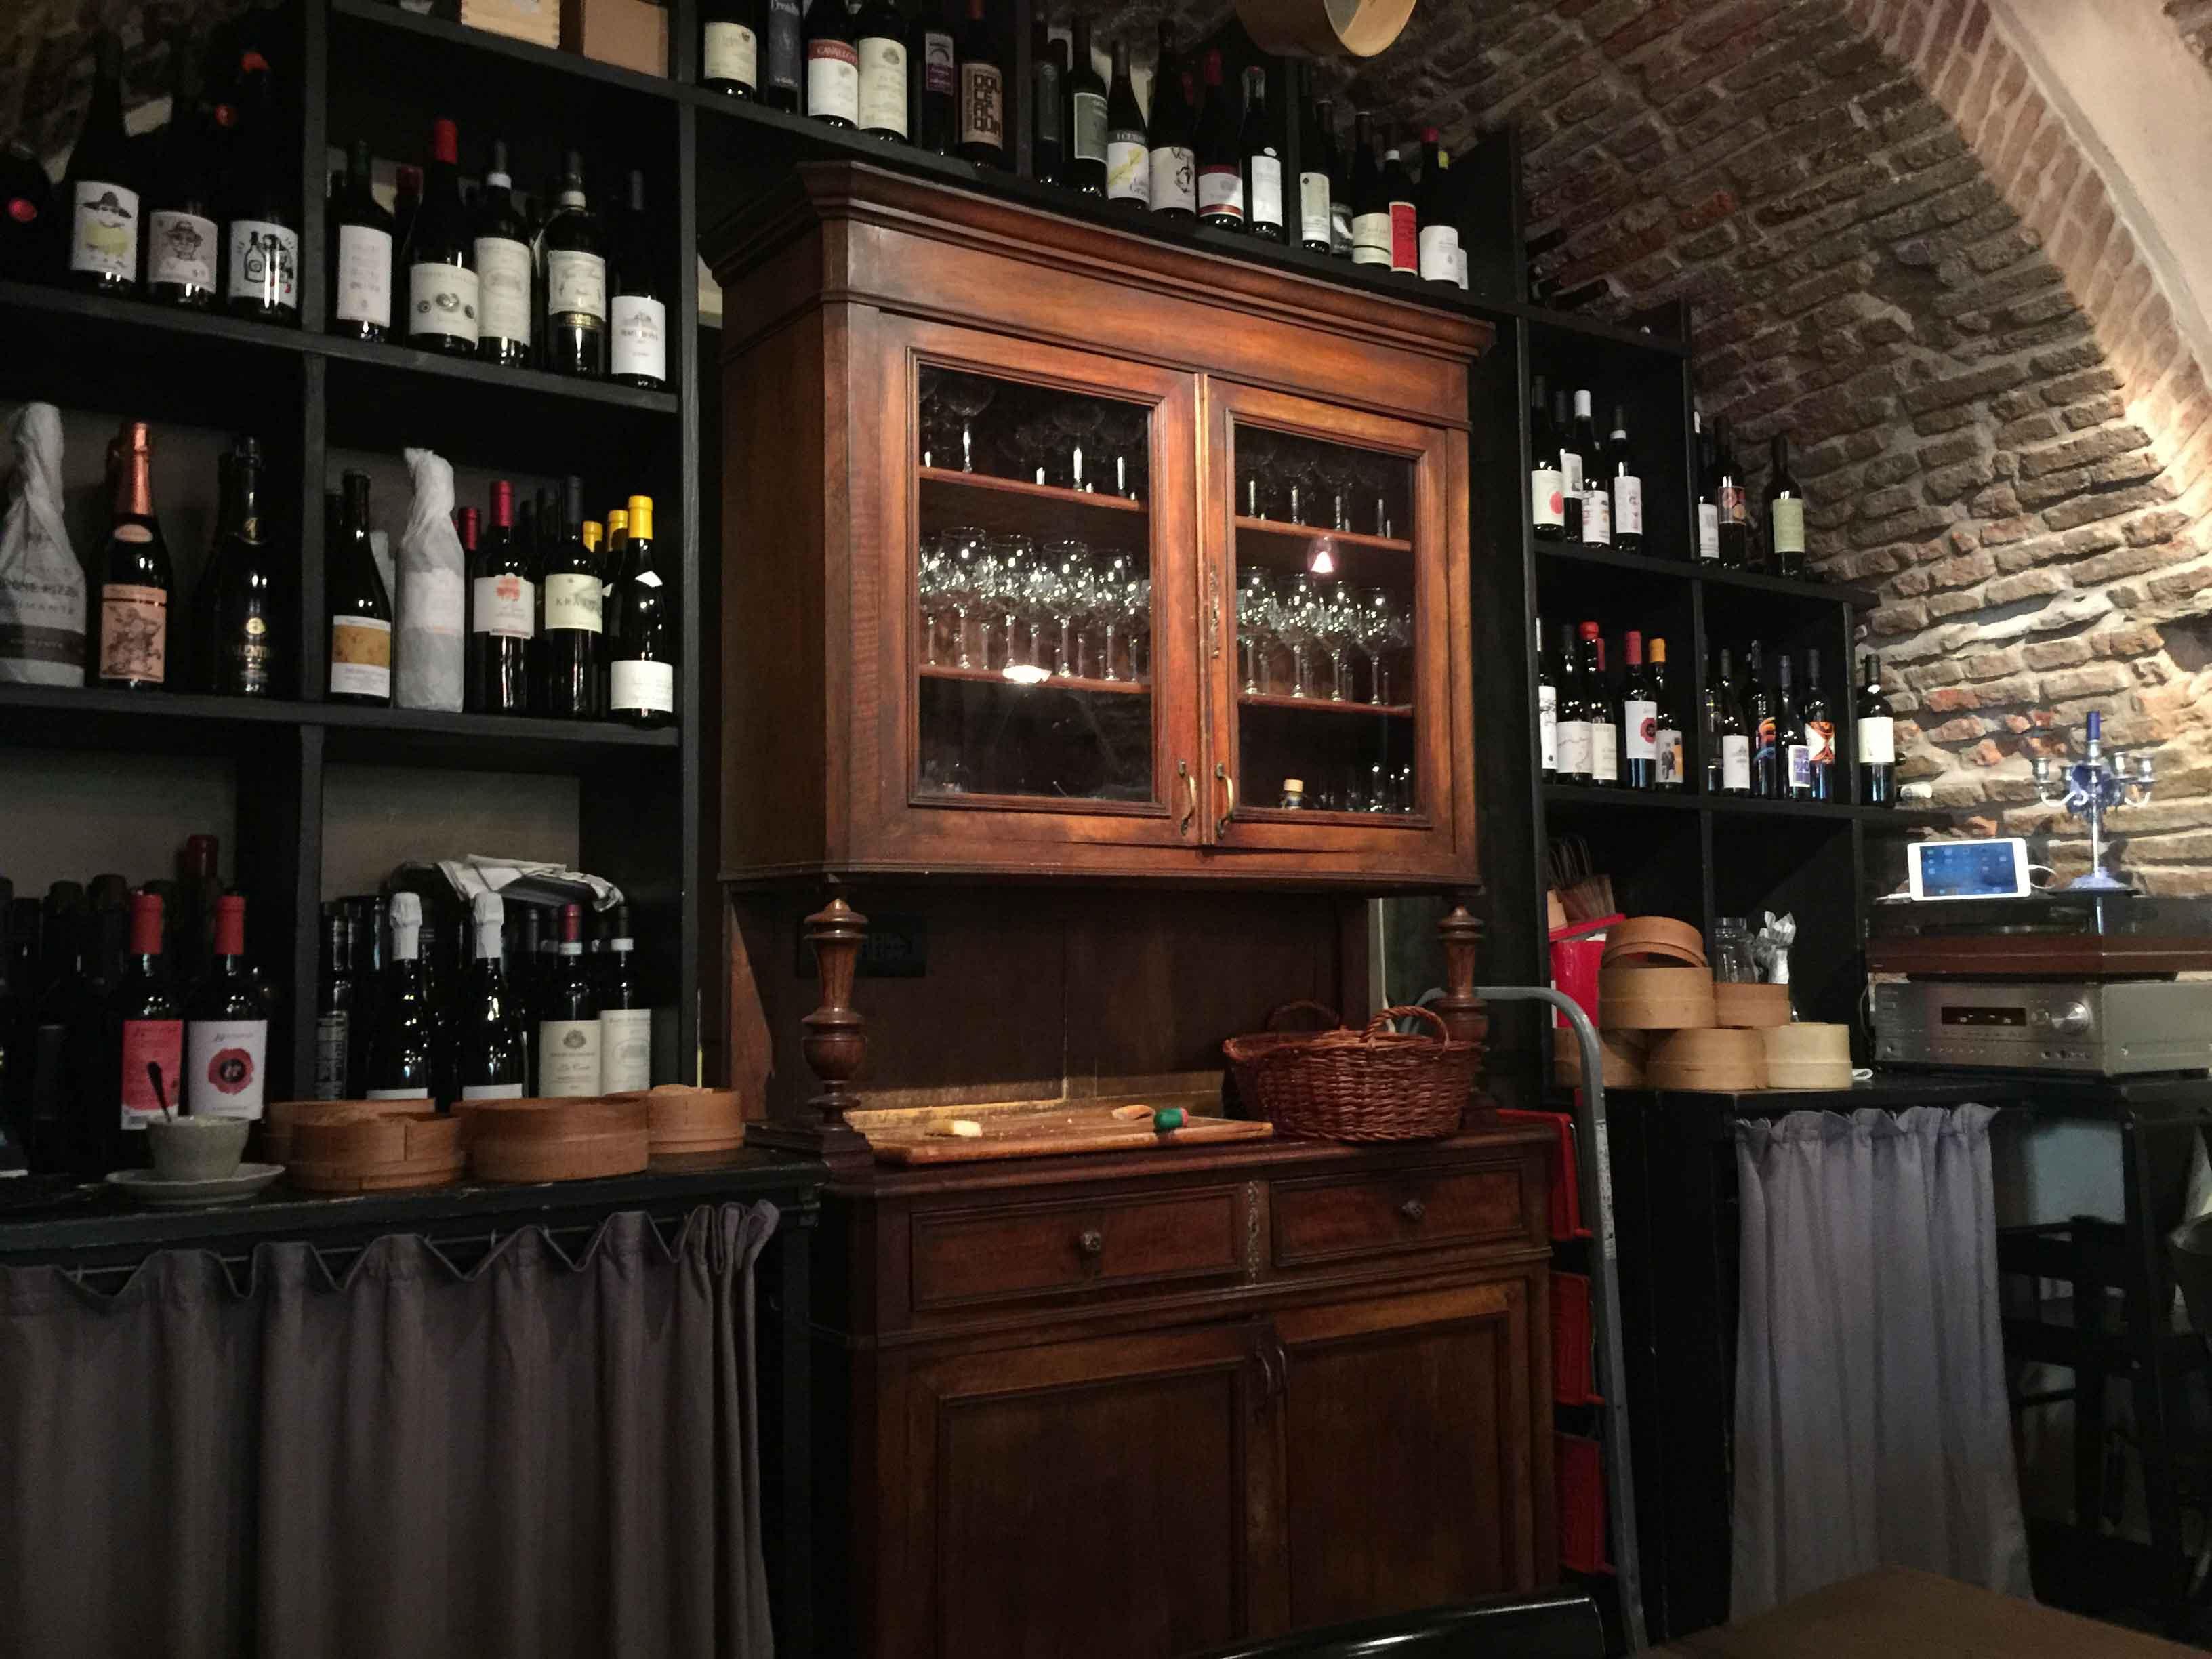 Chiavari cucina ligure a prezzi ottimi alla bottega nazionale - Vino e cucina chiavari ...